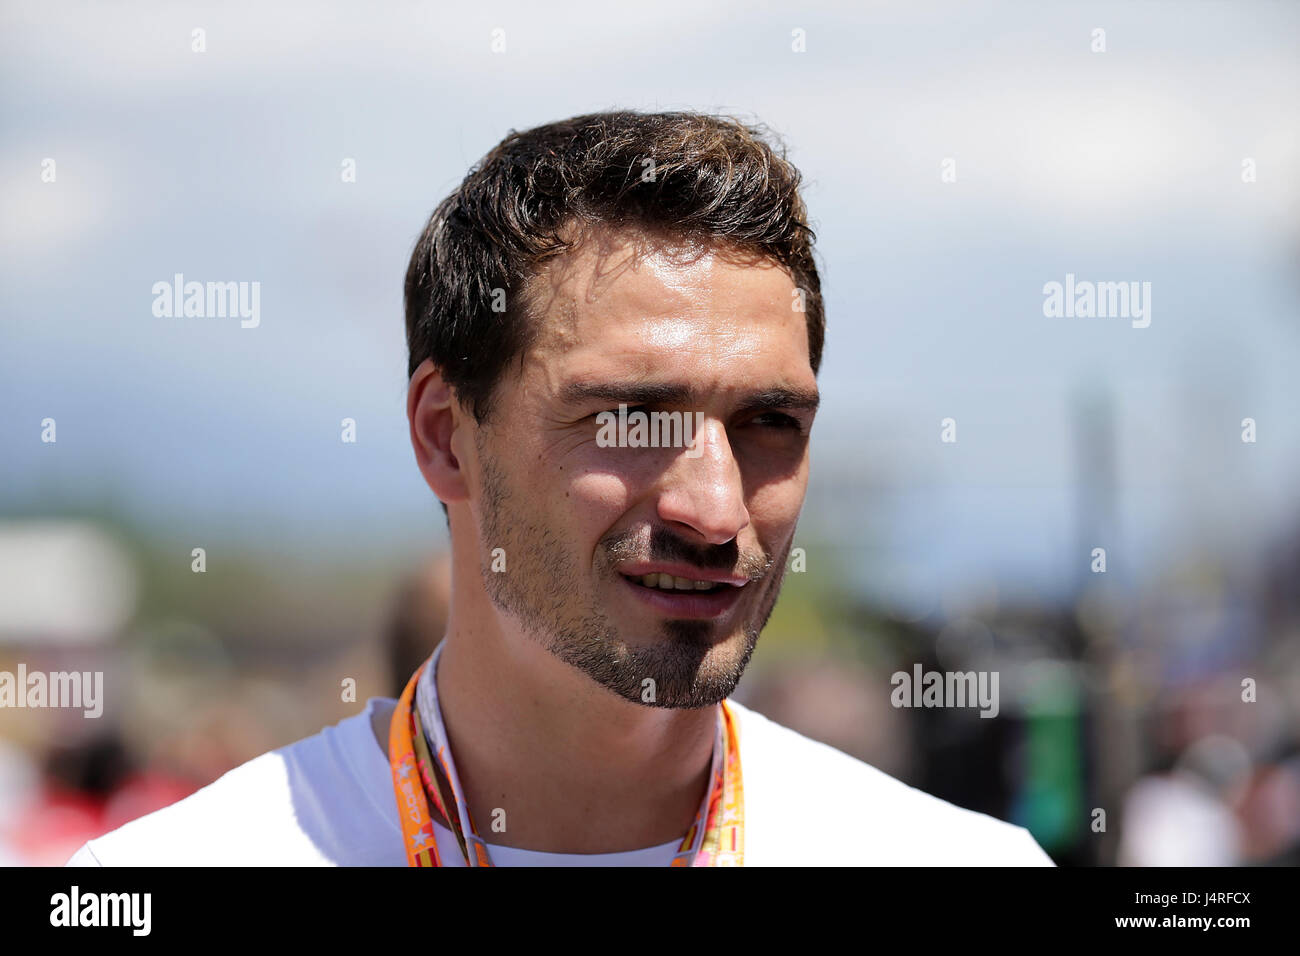 14.05.2017, Circuit de Catalunya, Barcelona, FORMULA 1 GRAN PREMIO DE ESPAÑA PIRELLI 2017  , im Bild Bayern - Stock Image